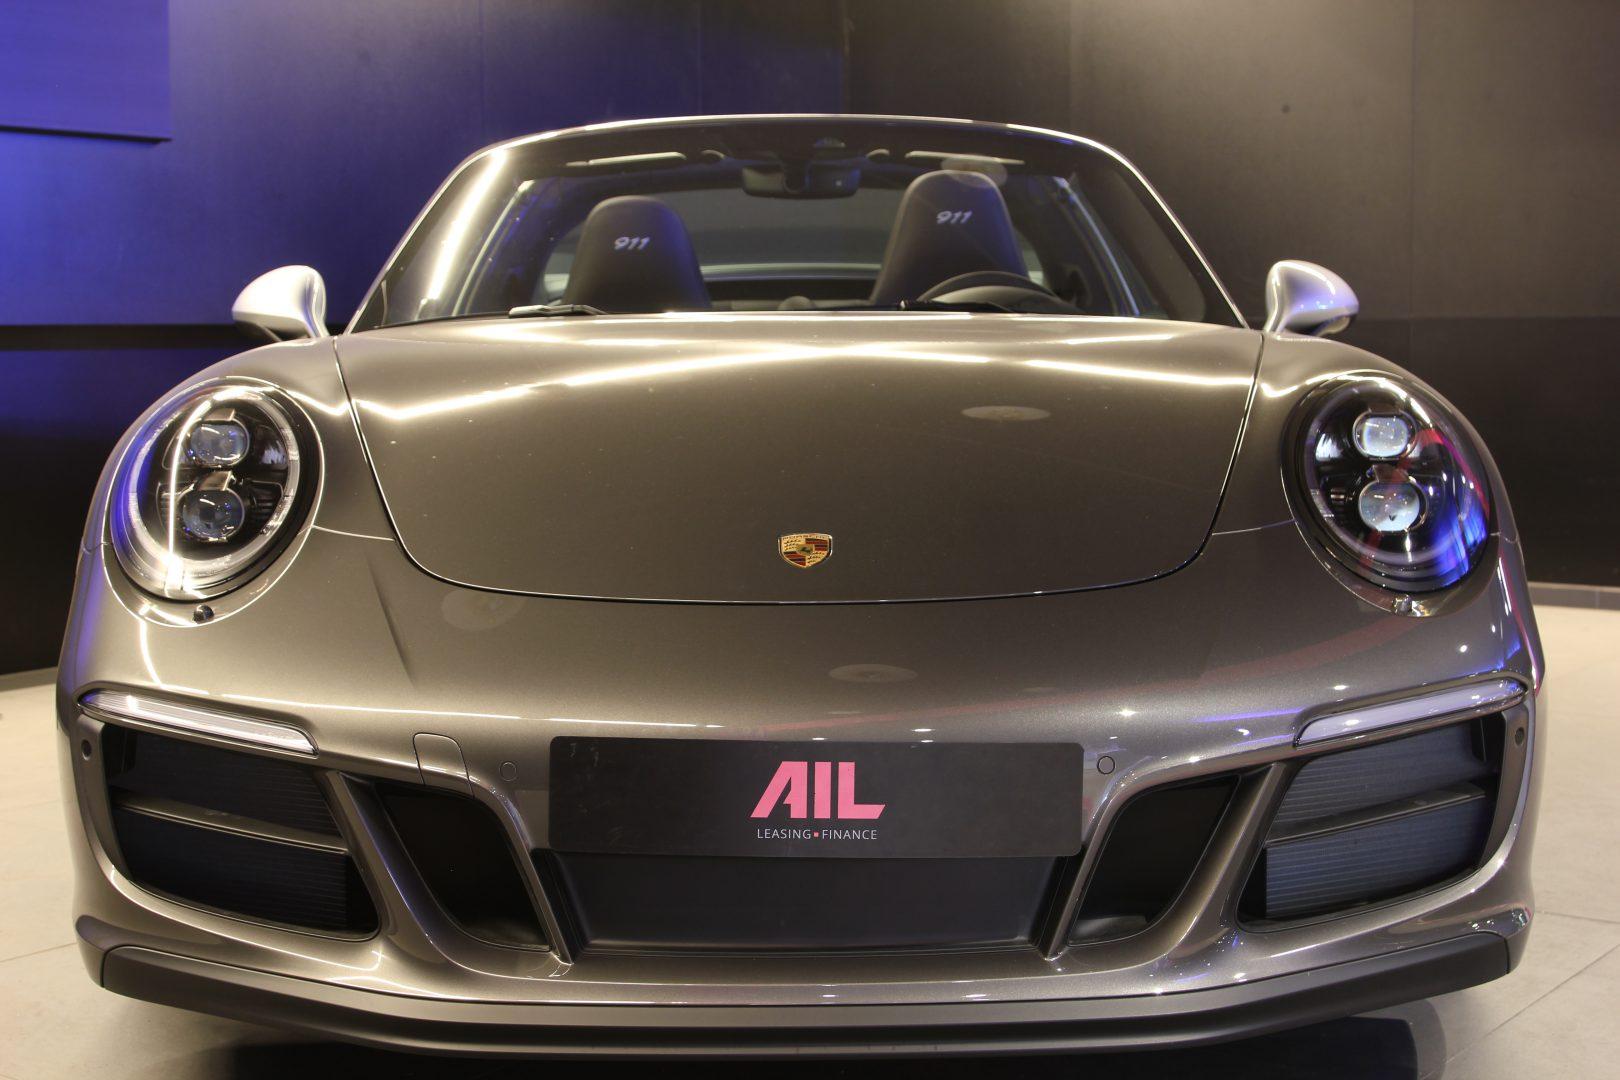 AIL Porsche 991 Targa 4 GTS Exclusiv 1